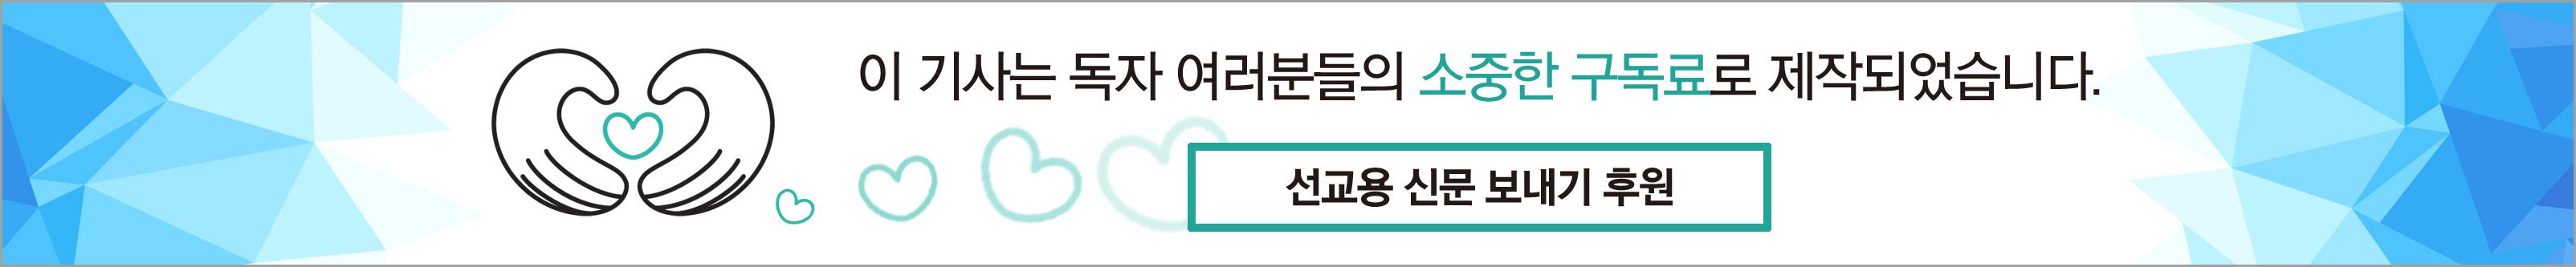 sub_banner1.jpg